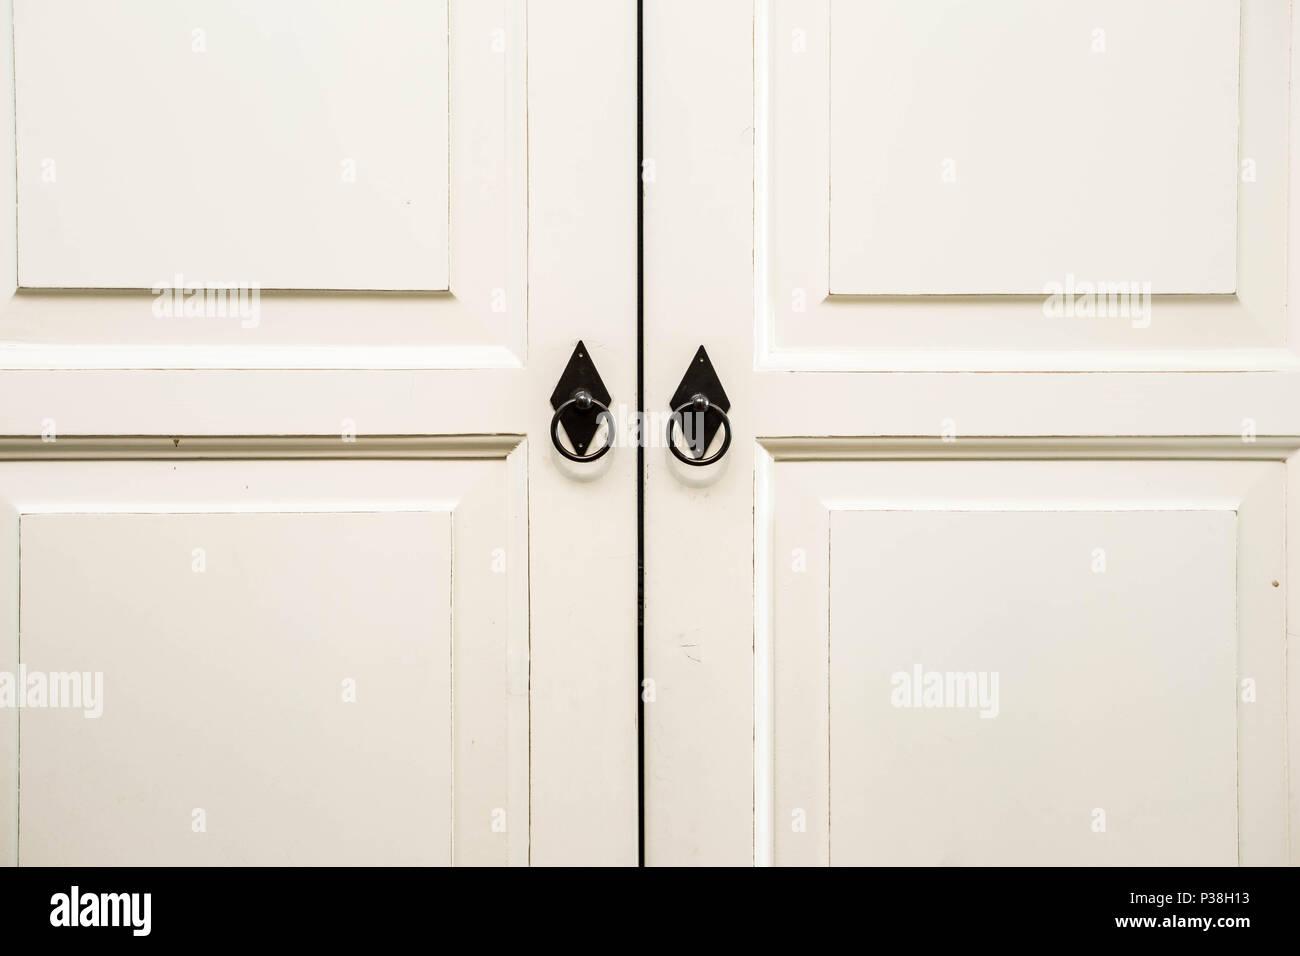 Vintage white wooden cupboard doors with metal handles - Stock Image